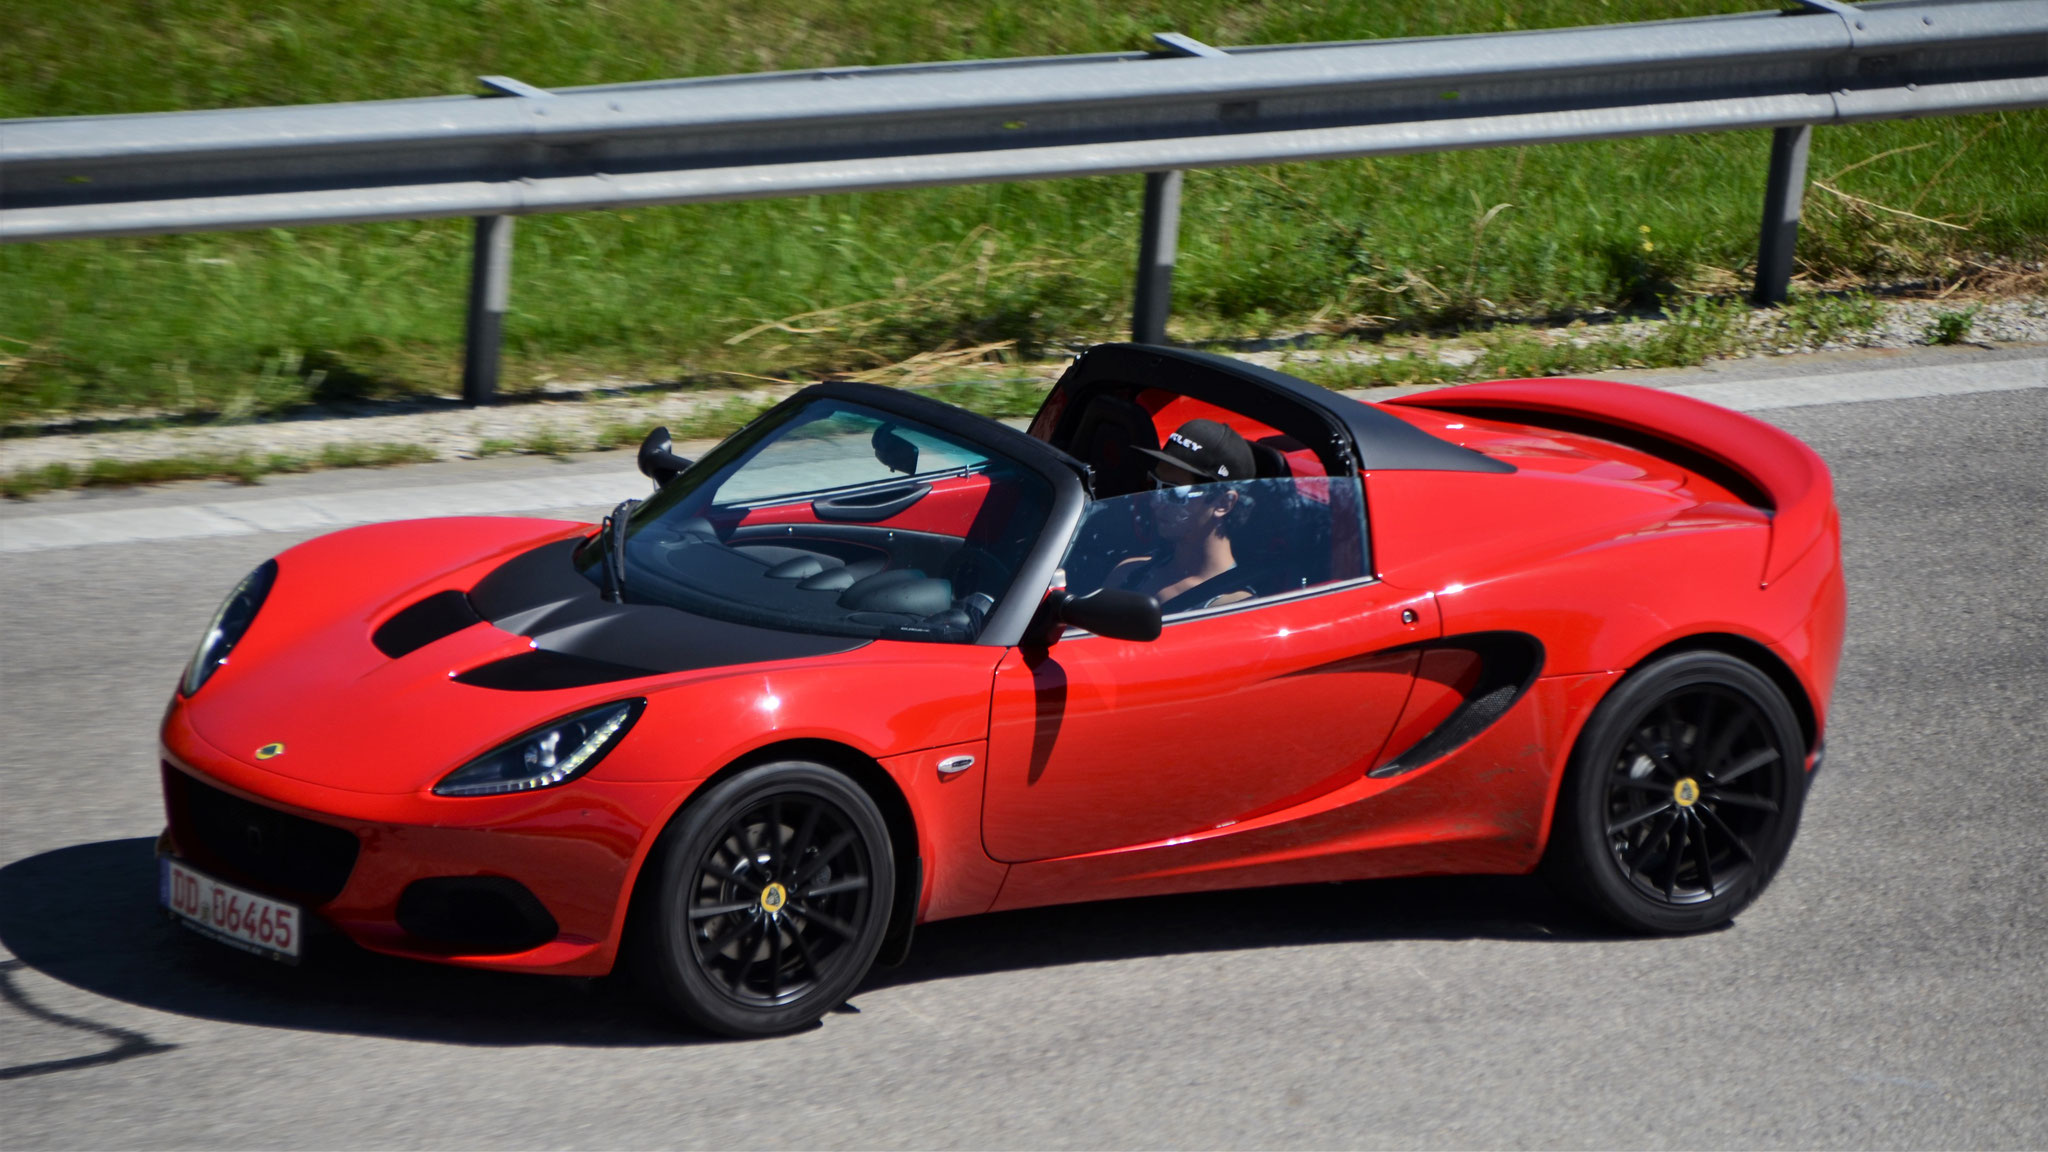 Lotus Elise S3 220 - DD-06468